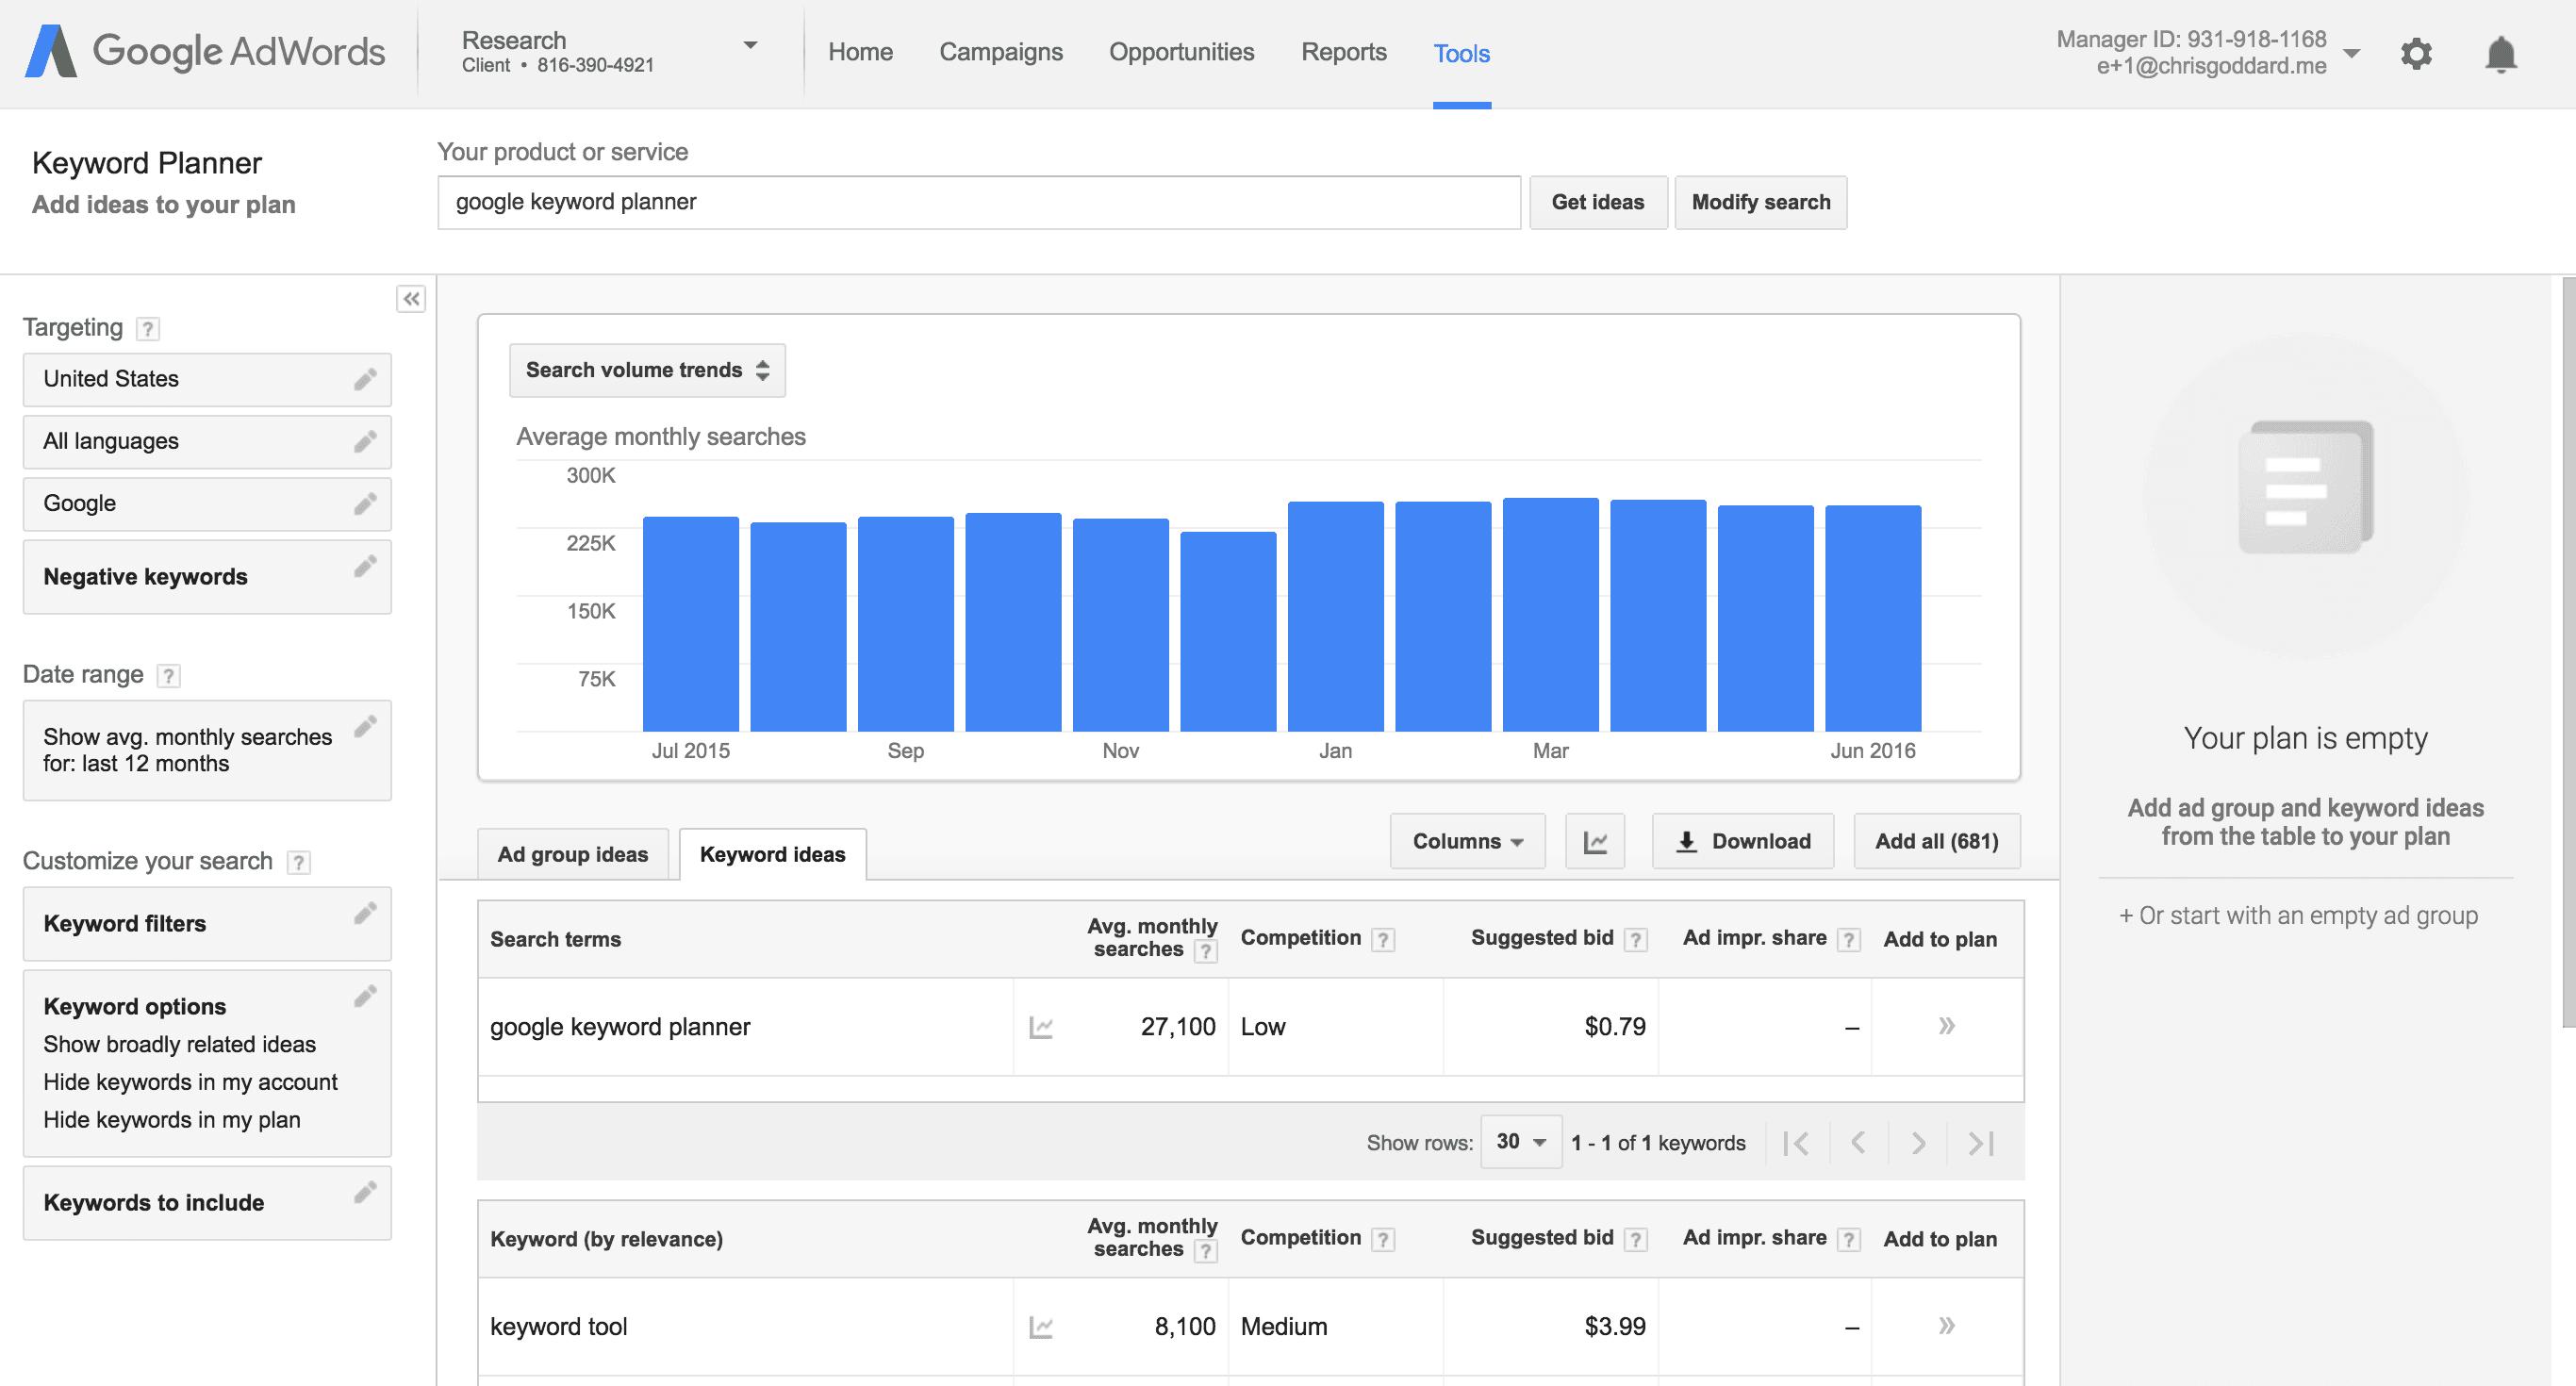 Guide To Google Keyword Planner For Seo   Serps throughout KeywordAverage MonthlysearchesArticleKeyword Tags